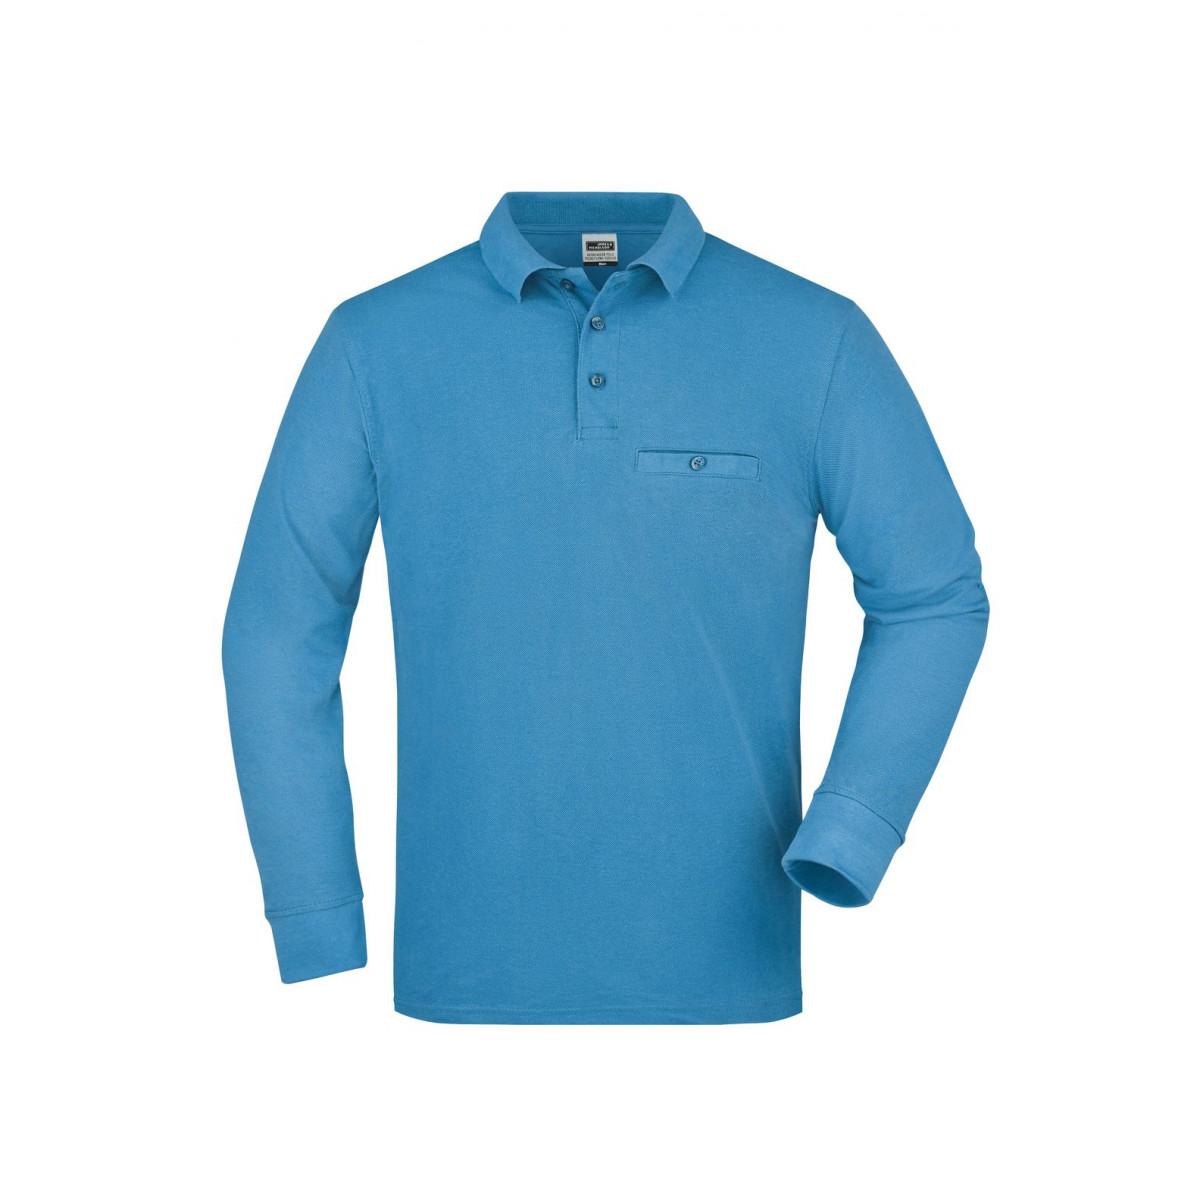 Рубашка поло мужская JN866 Mens Workwear Polo Pocket Longsleeve - Аква